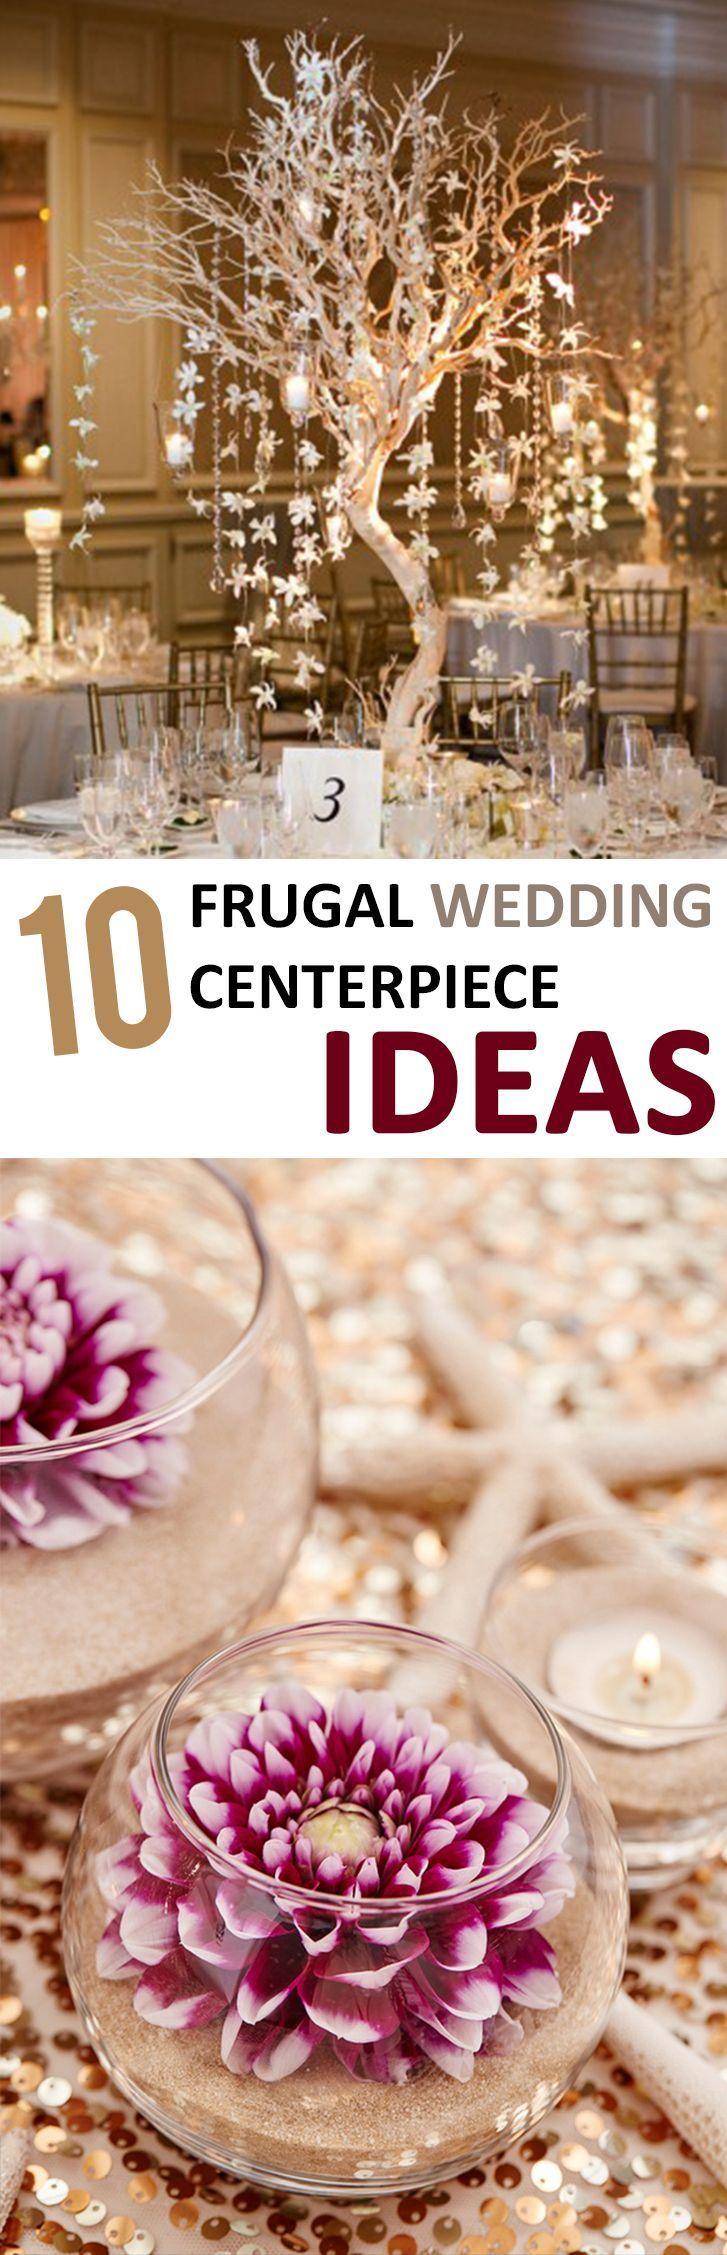 Frugal Wedding Centerpiece Ideas  Centerpiece Ideas  Pinterest